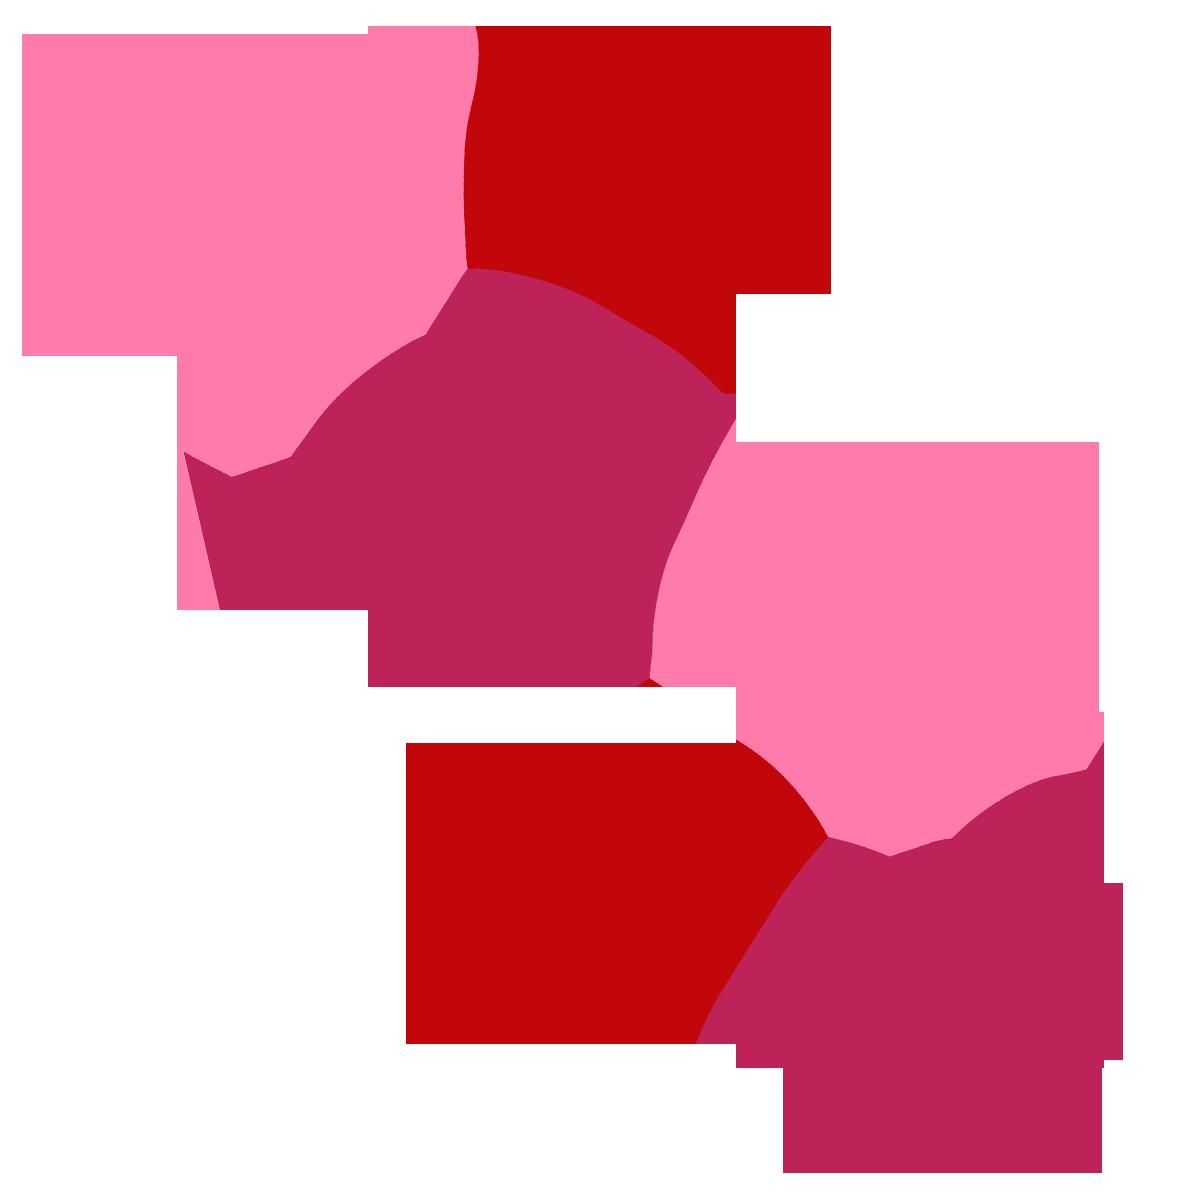 Hearts heart clip art heart i - Clip Art Hearts